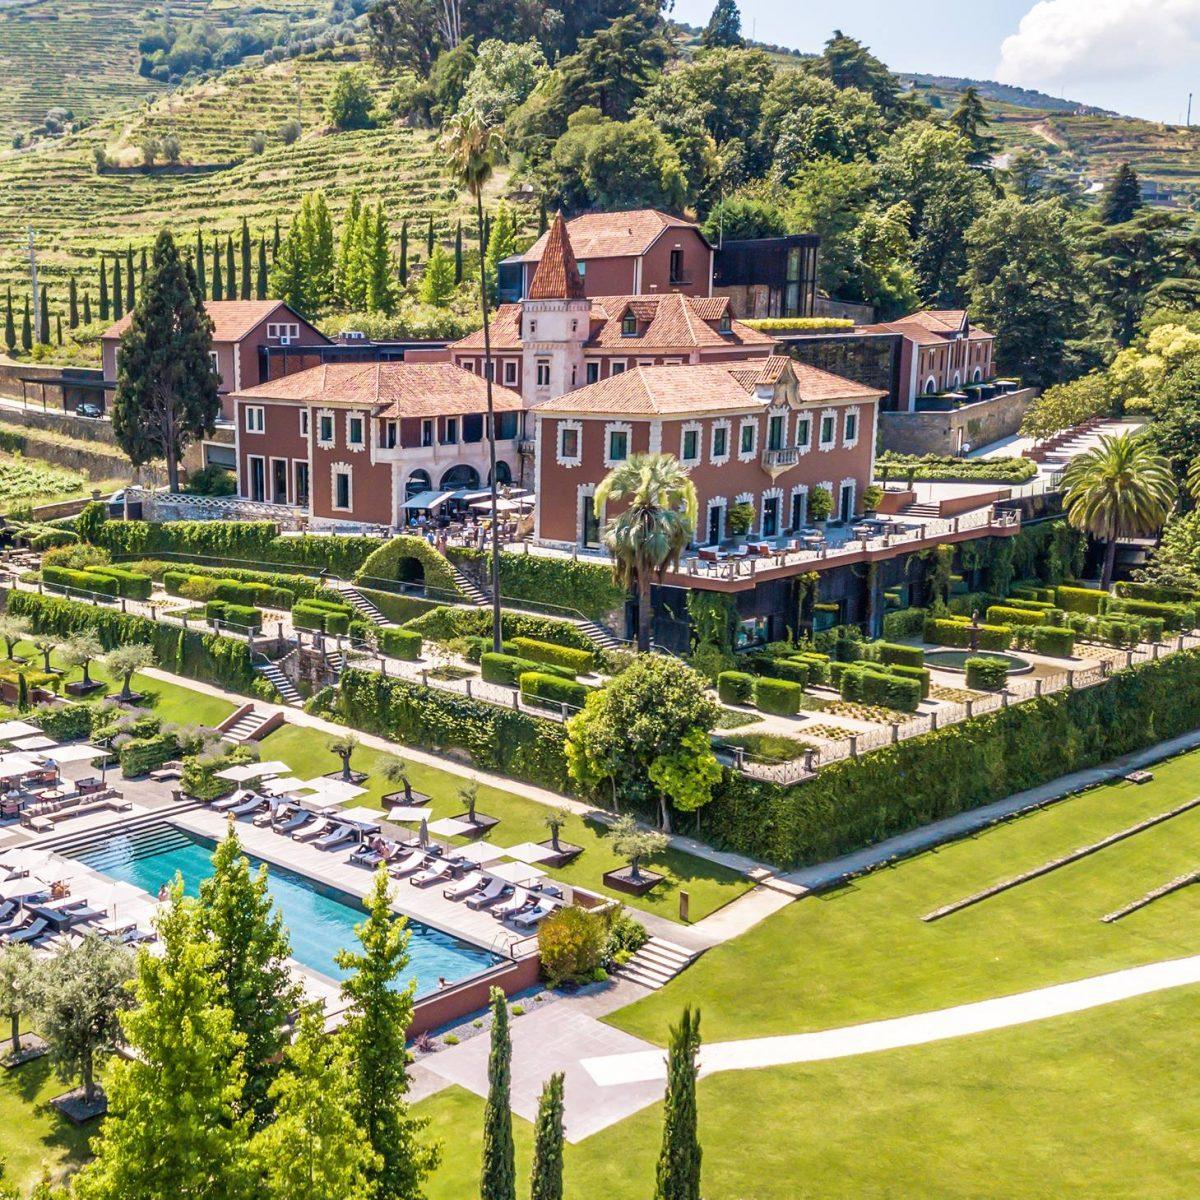 Secrets Itinerary: Top 5 Best Places In Douro Valley douro valley Secrets Itinerary: Top Places In The Douro Valley 1459 1459 6dd009196dc27eb5719d9f3b51cca85f e1563288922471